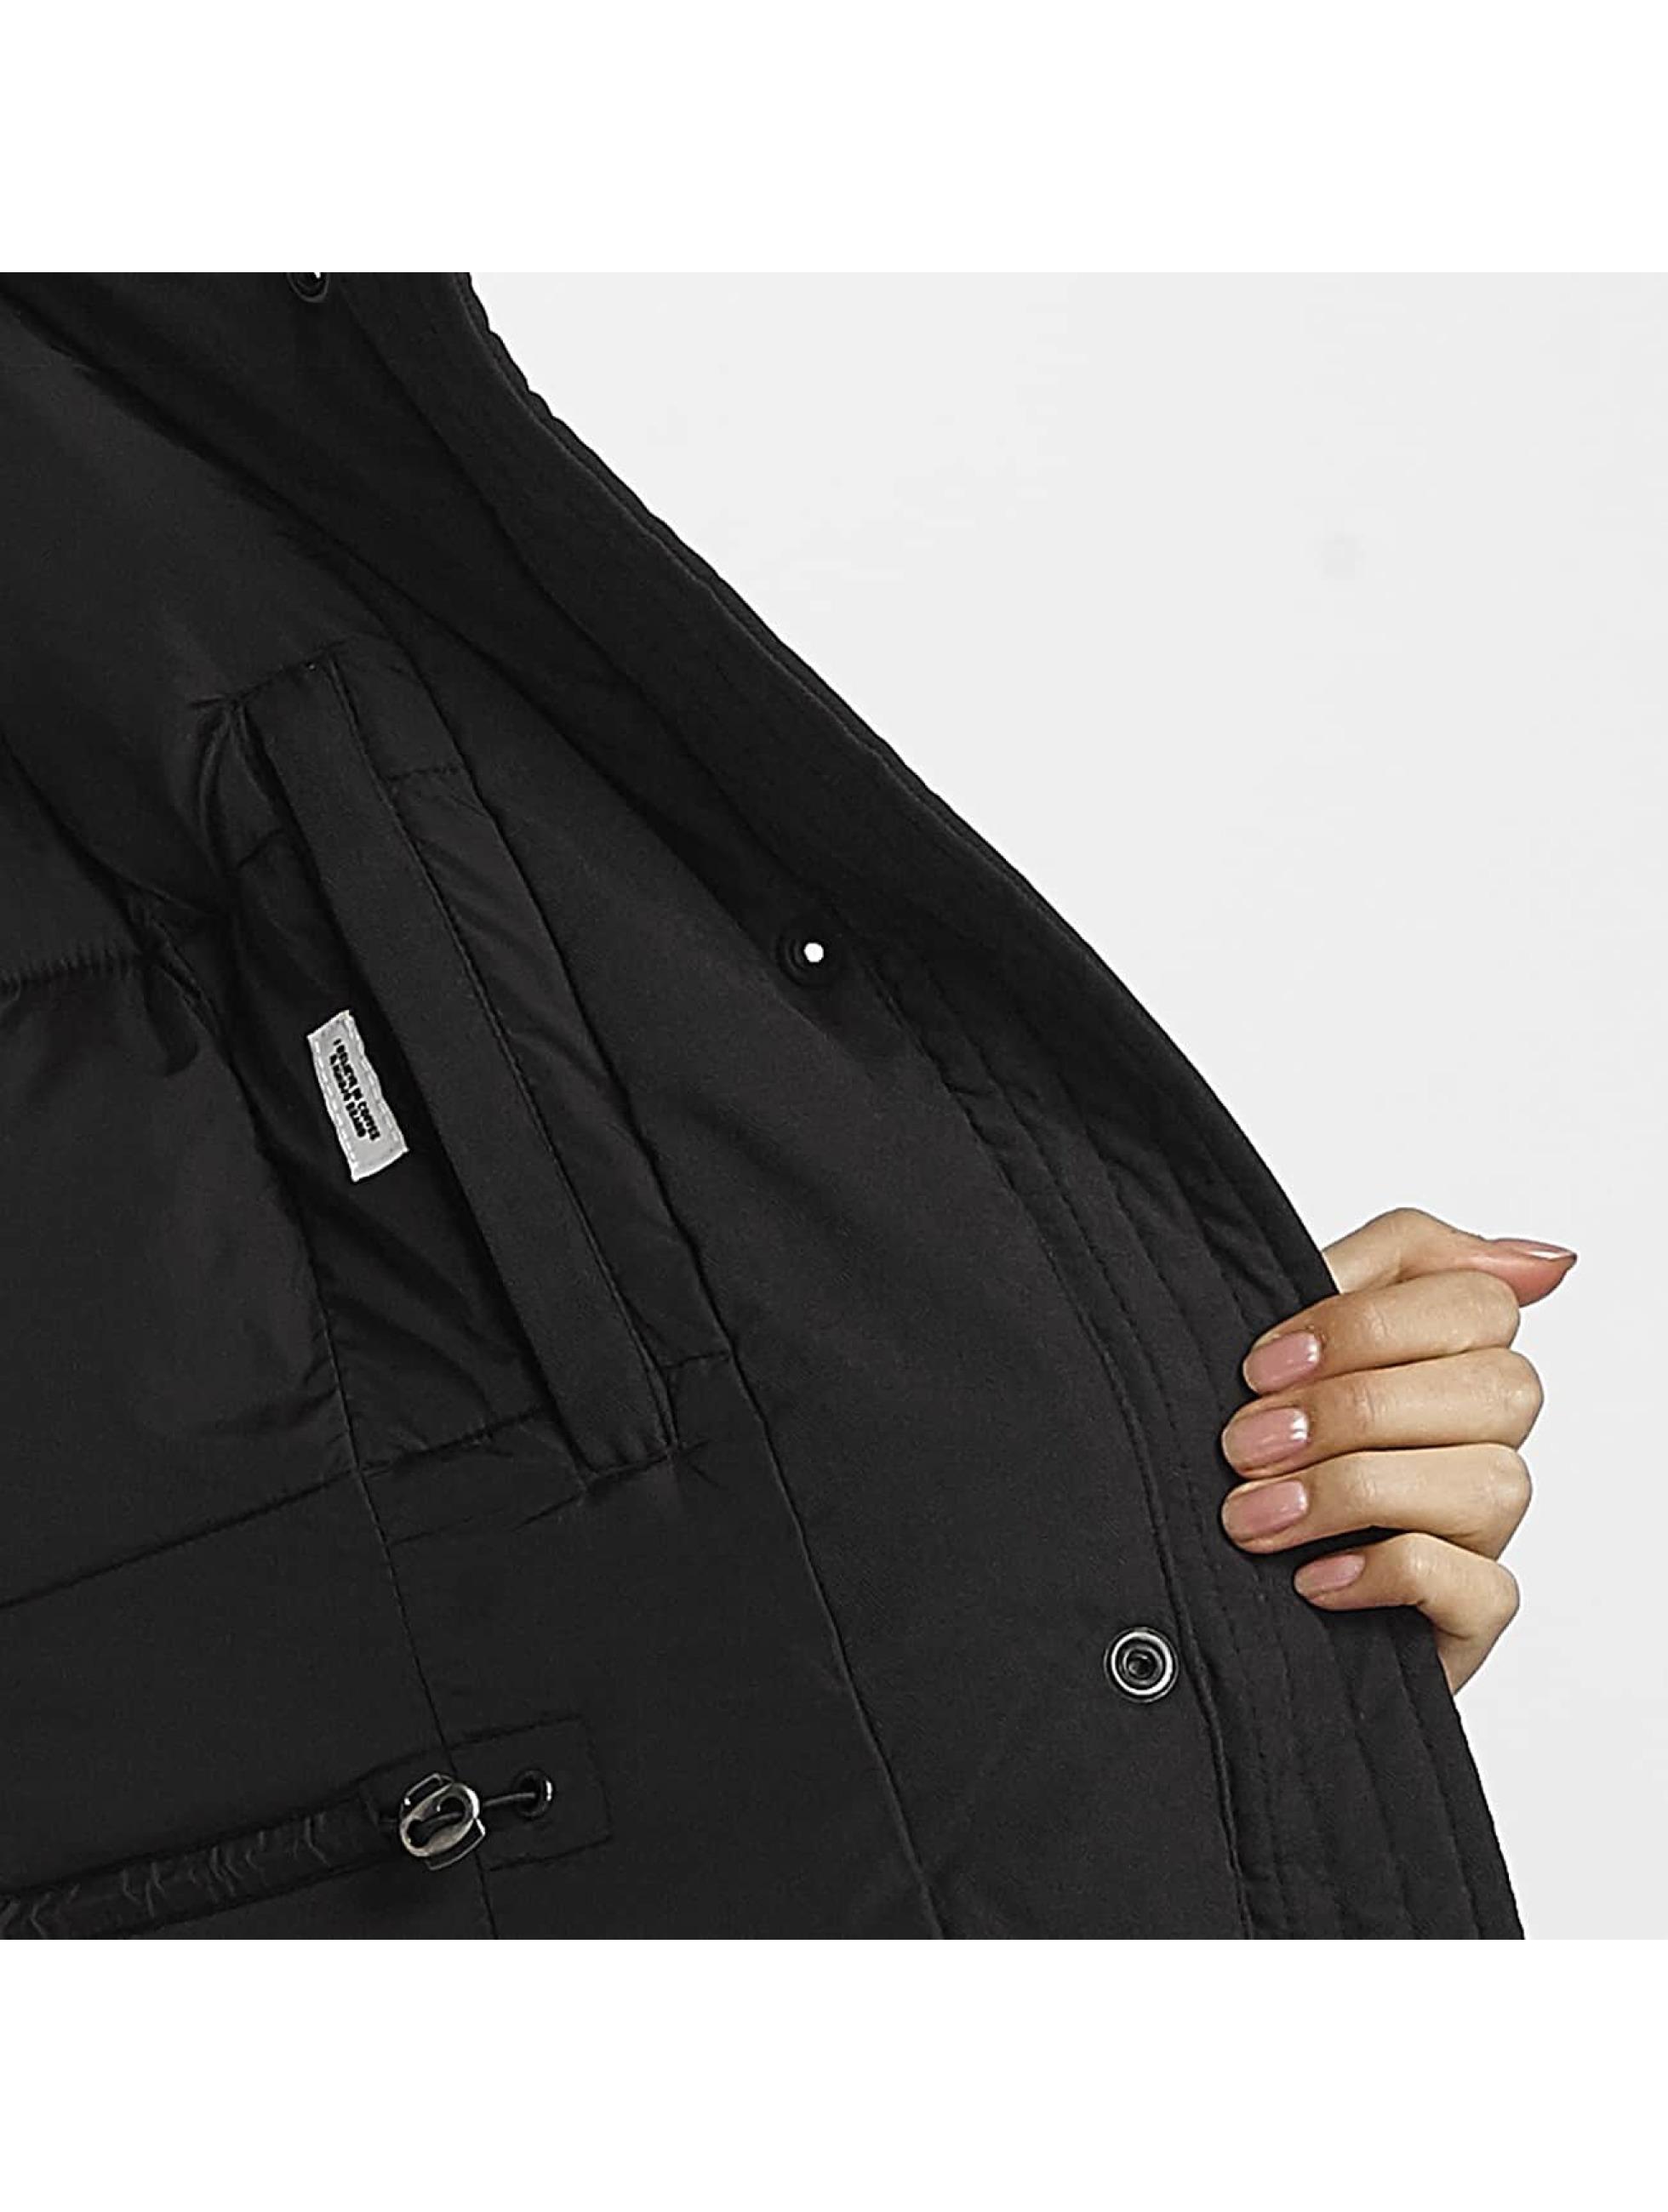 Khujo Lightweight Jacket Romy black